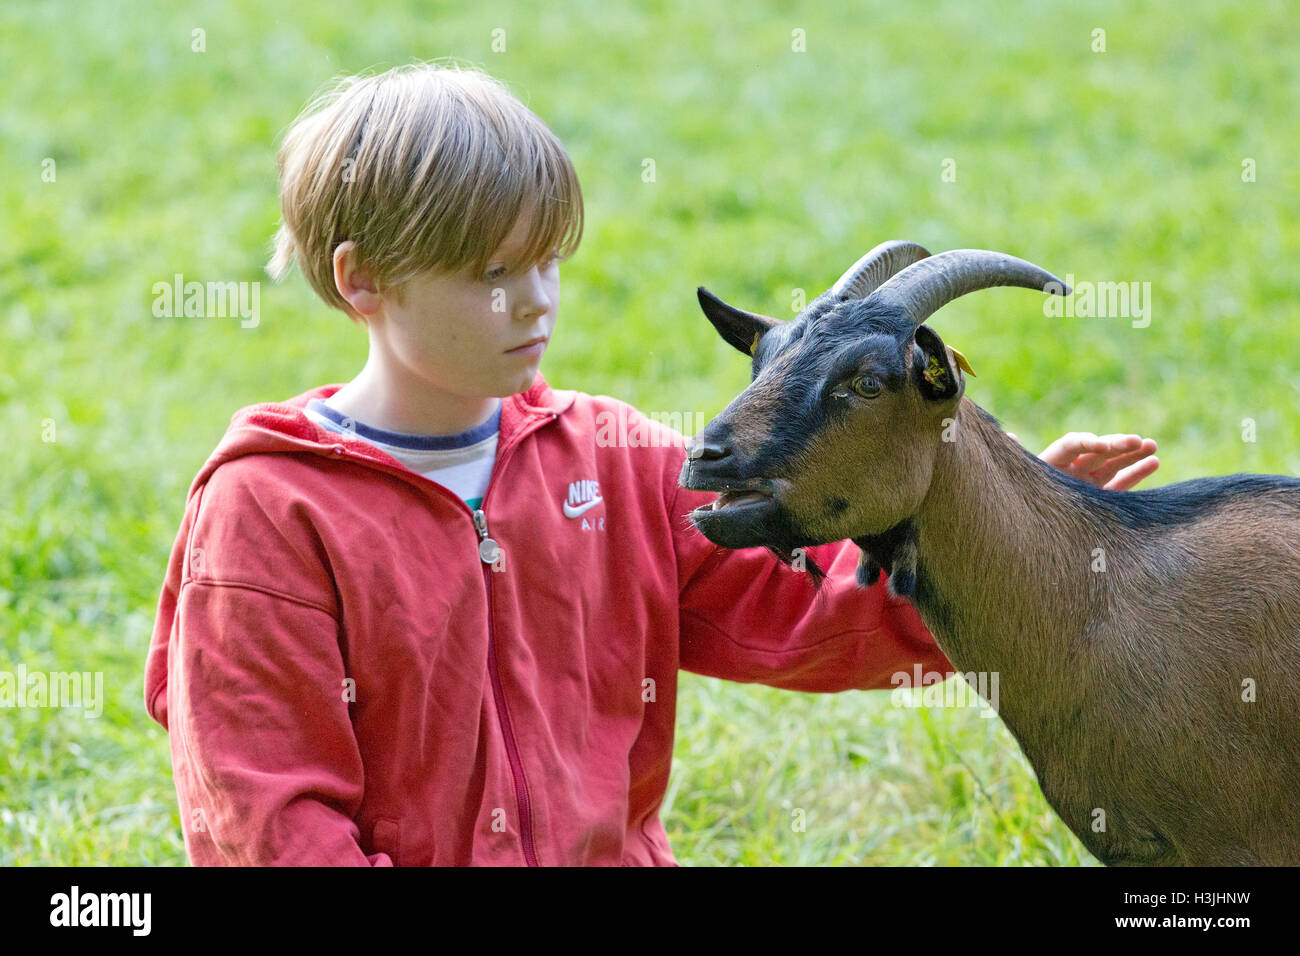 Boy acariciar cabras, Wildpark Schwarze Berge, Baja Sajonia, Alemania Imagen De Stock